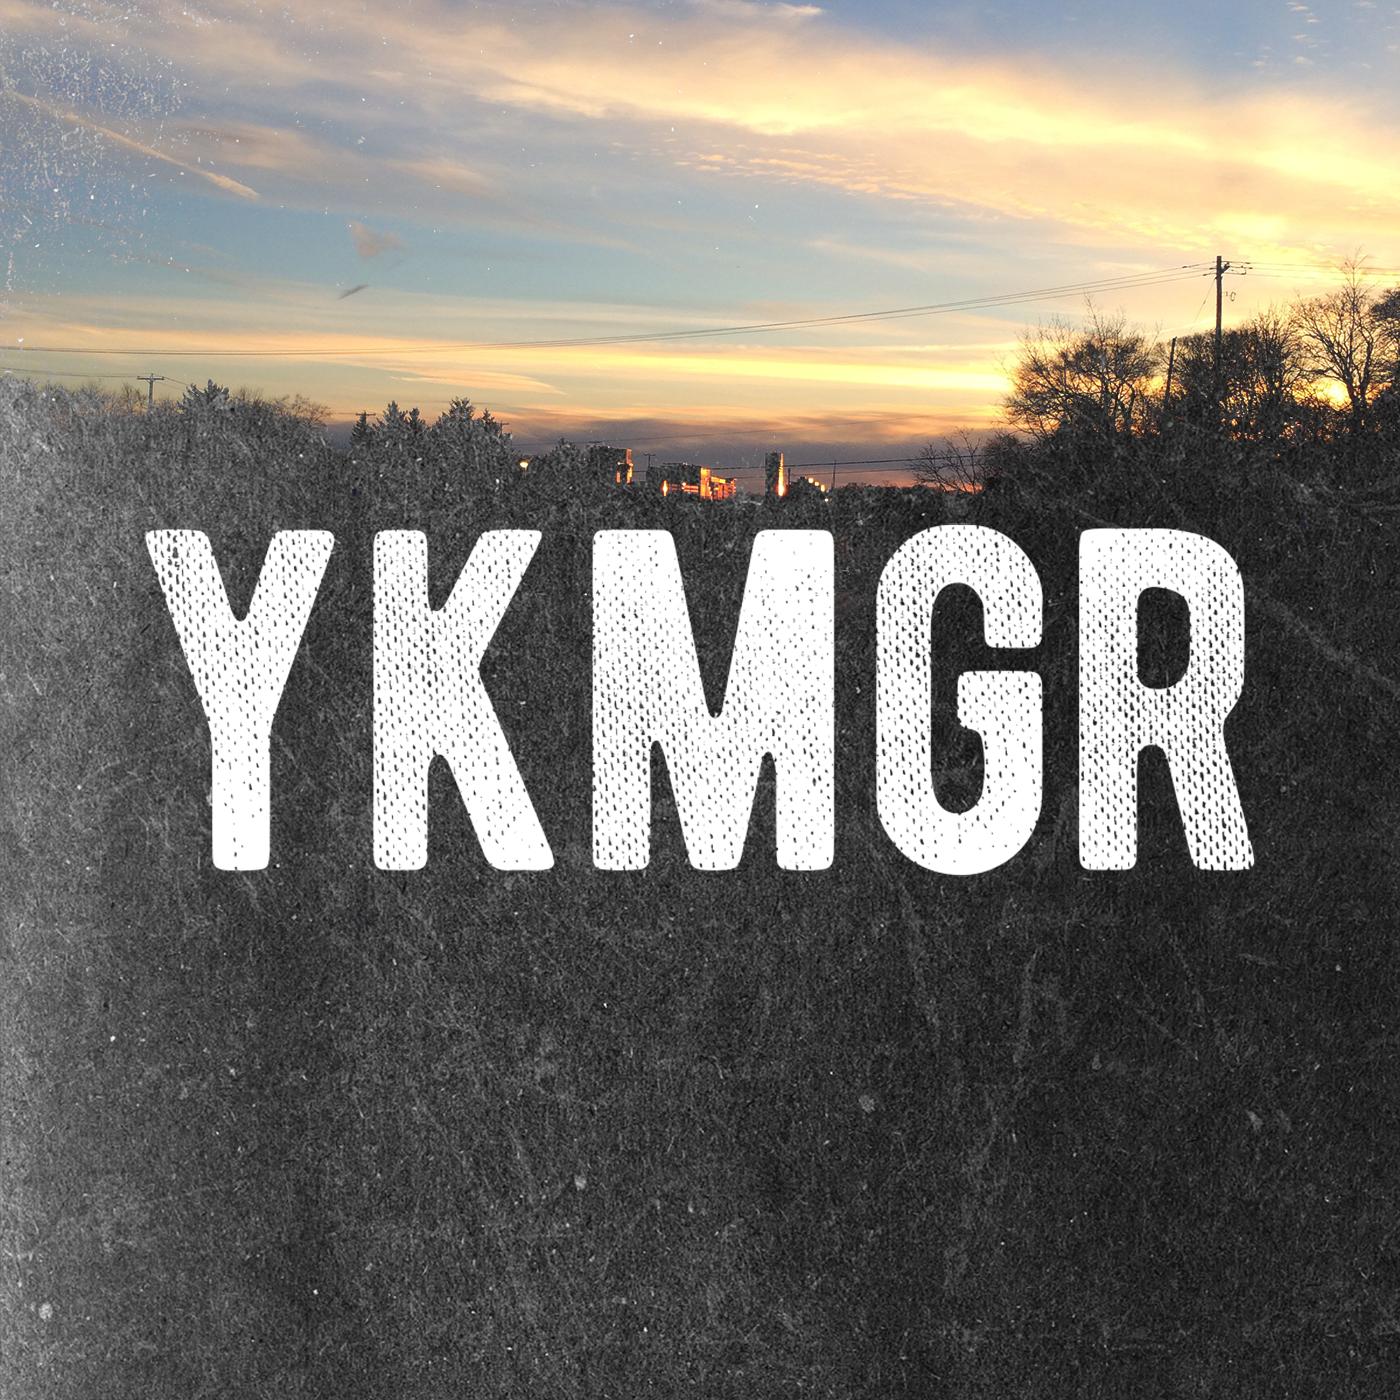 YKMGR 09.png